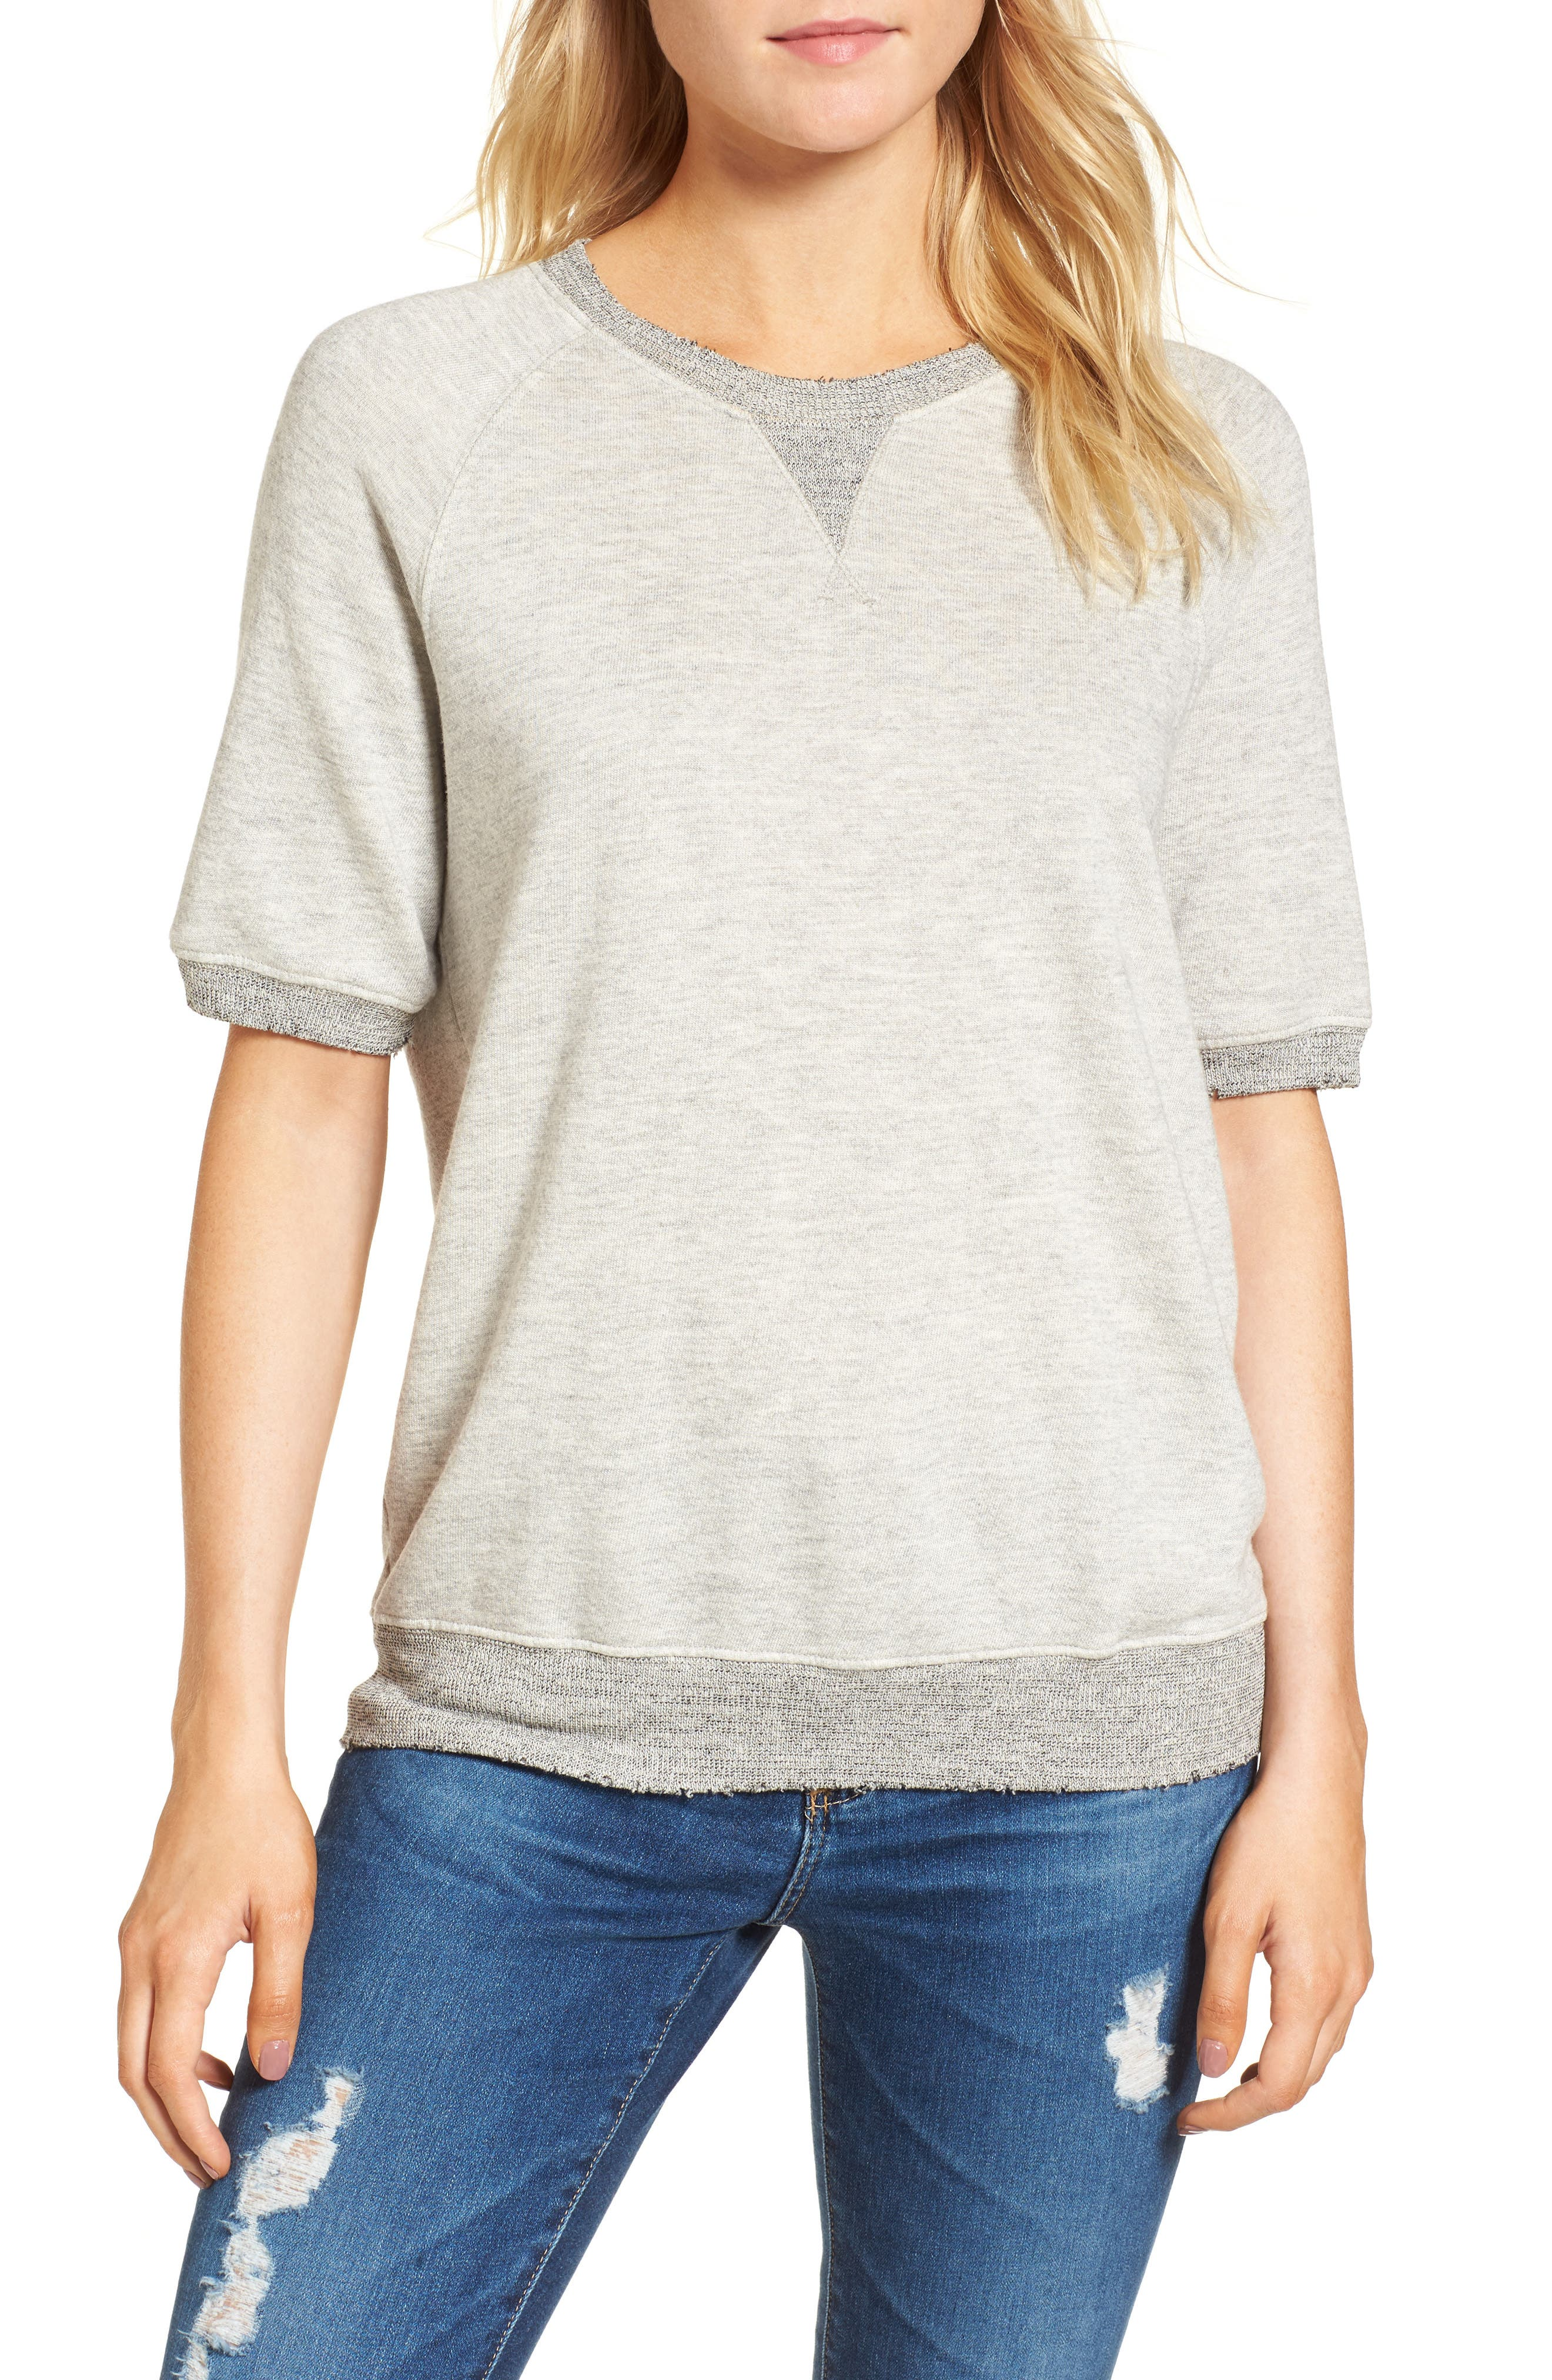 Ace Sweatshirt,                         Main,                         color, 030